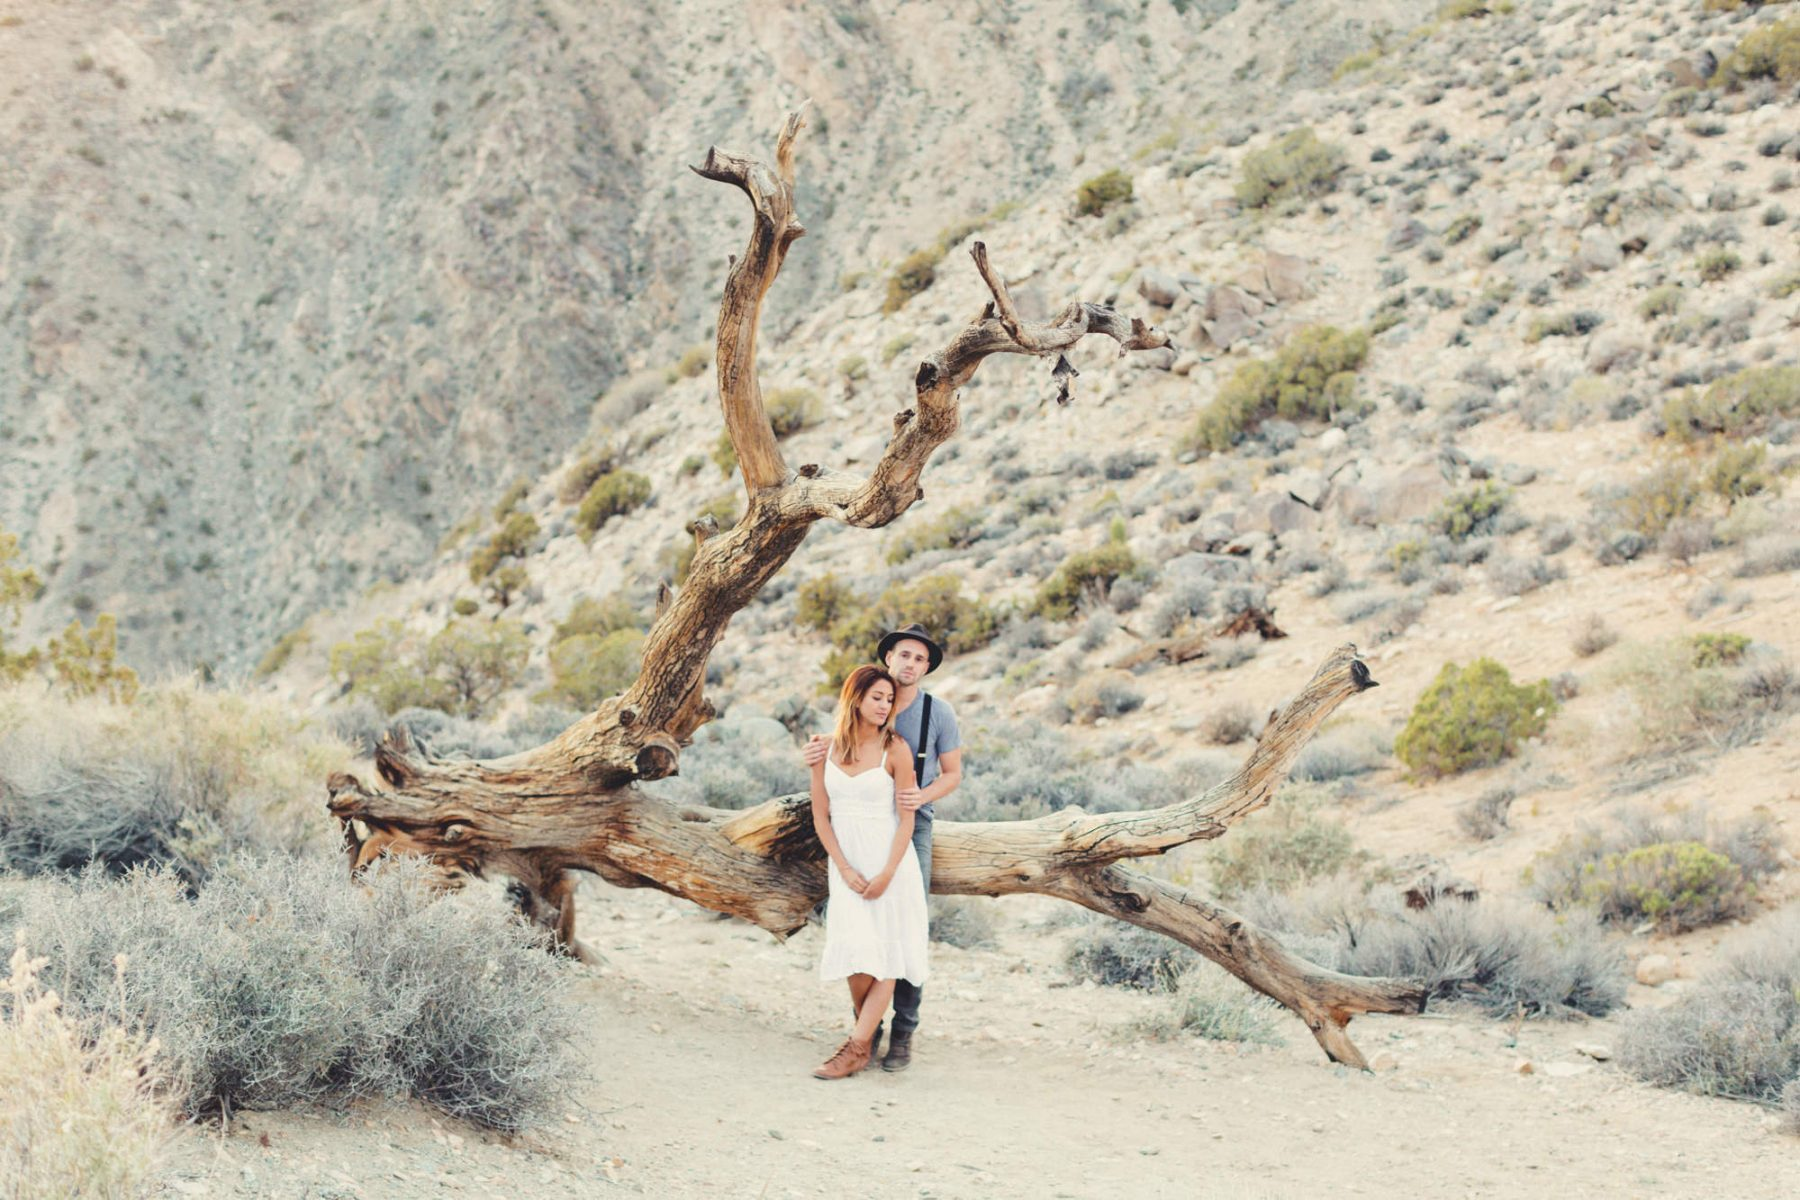 California-wedding-photographer-anne-claire-brun 39